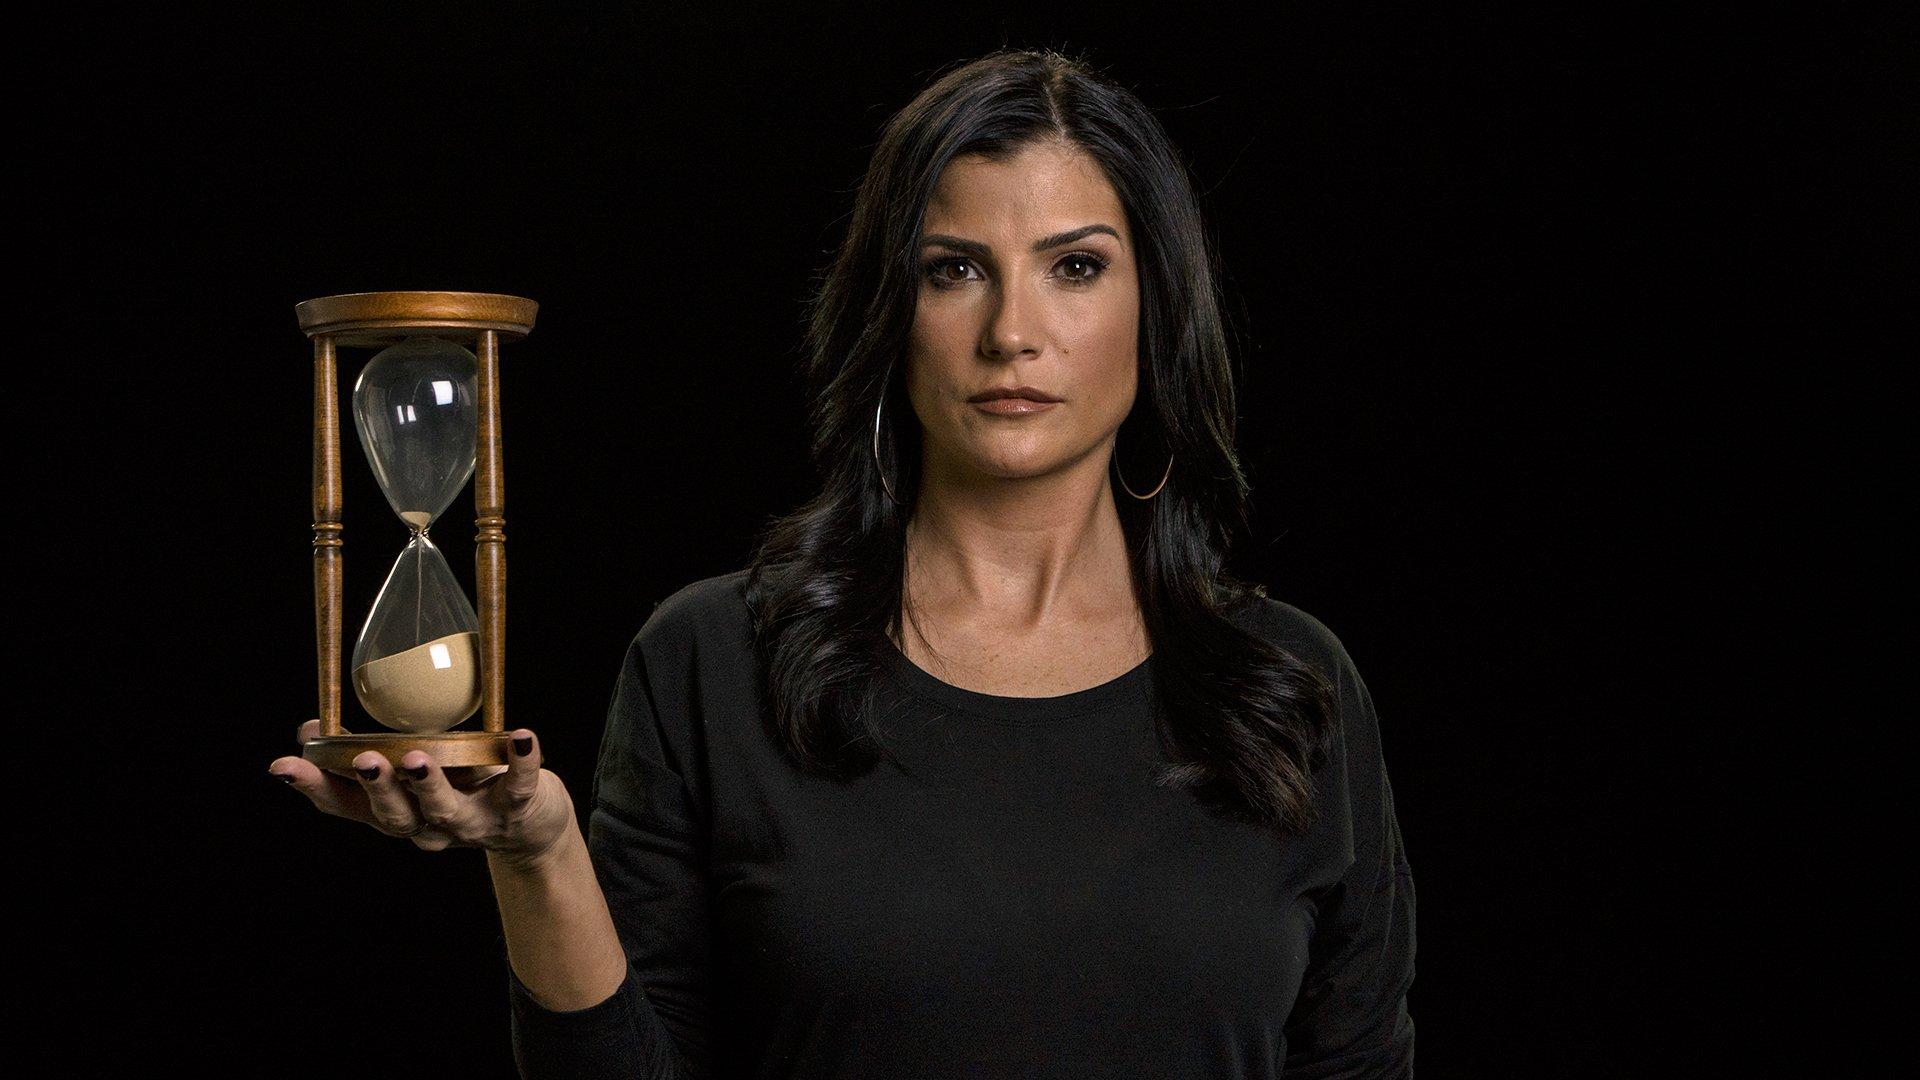 ゚ヌᄎ゚ヌᄌ゚ヌᄎ゚ヌᄌ @DLoesch Dana Loesch: ¬タワThe Clock Starts Now¬タン ゚ヌᄎ゚ヌᄌ゚ヌᄎ゚ヌᄌ #MAGA  #NRA @NRA  #JoinTheNRA #2ADefenders            https://t.co/LbyASkRygq